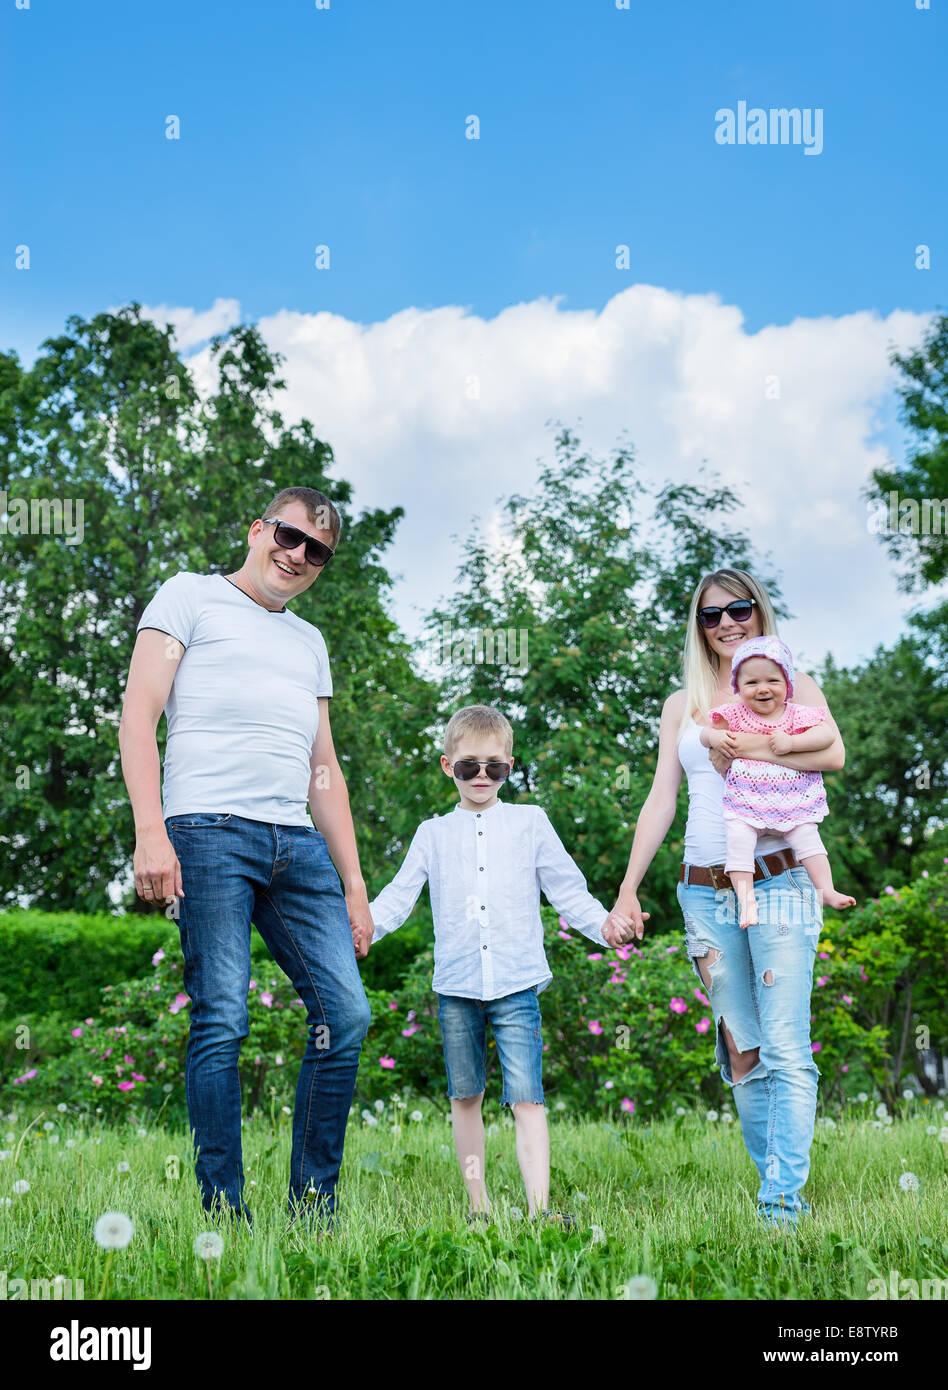 Portrait Of Happy Family In Garden - Stock Image